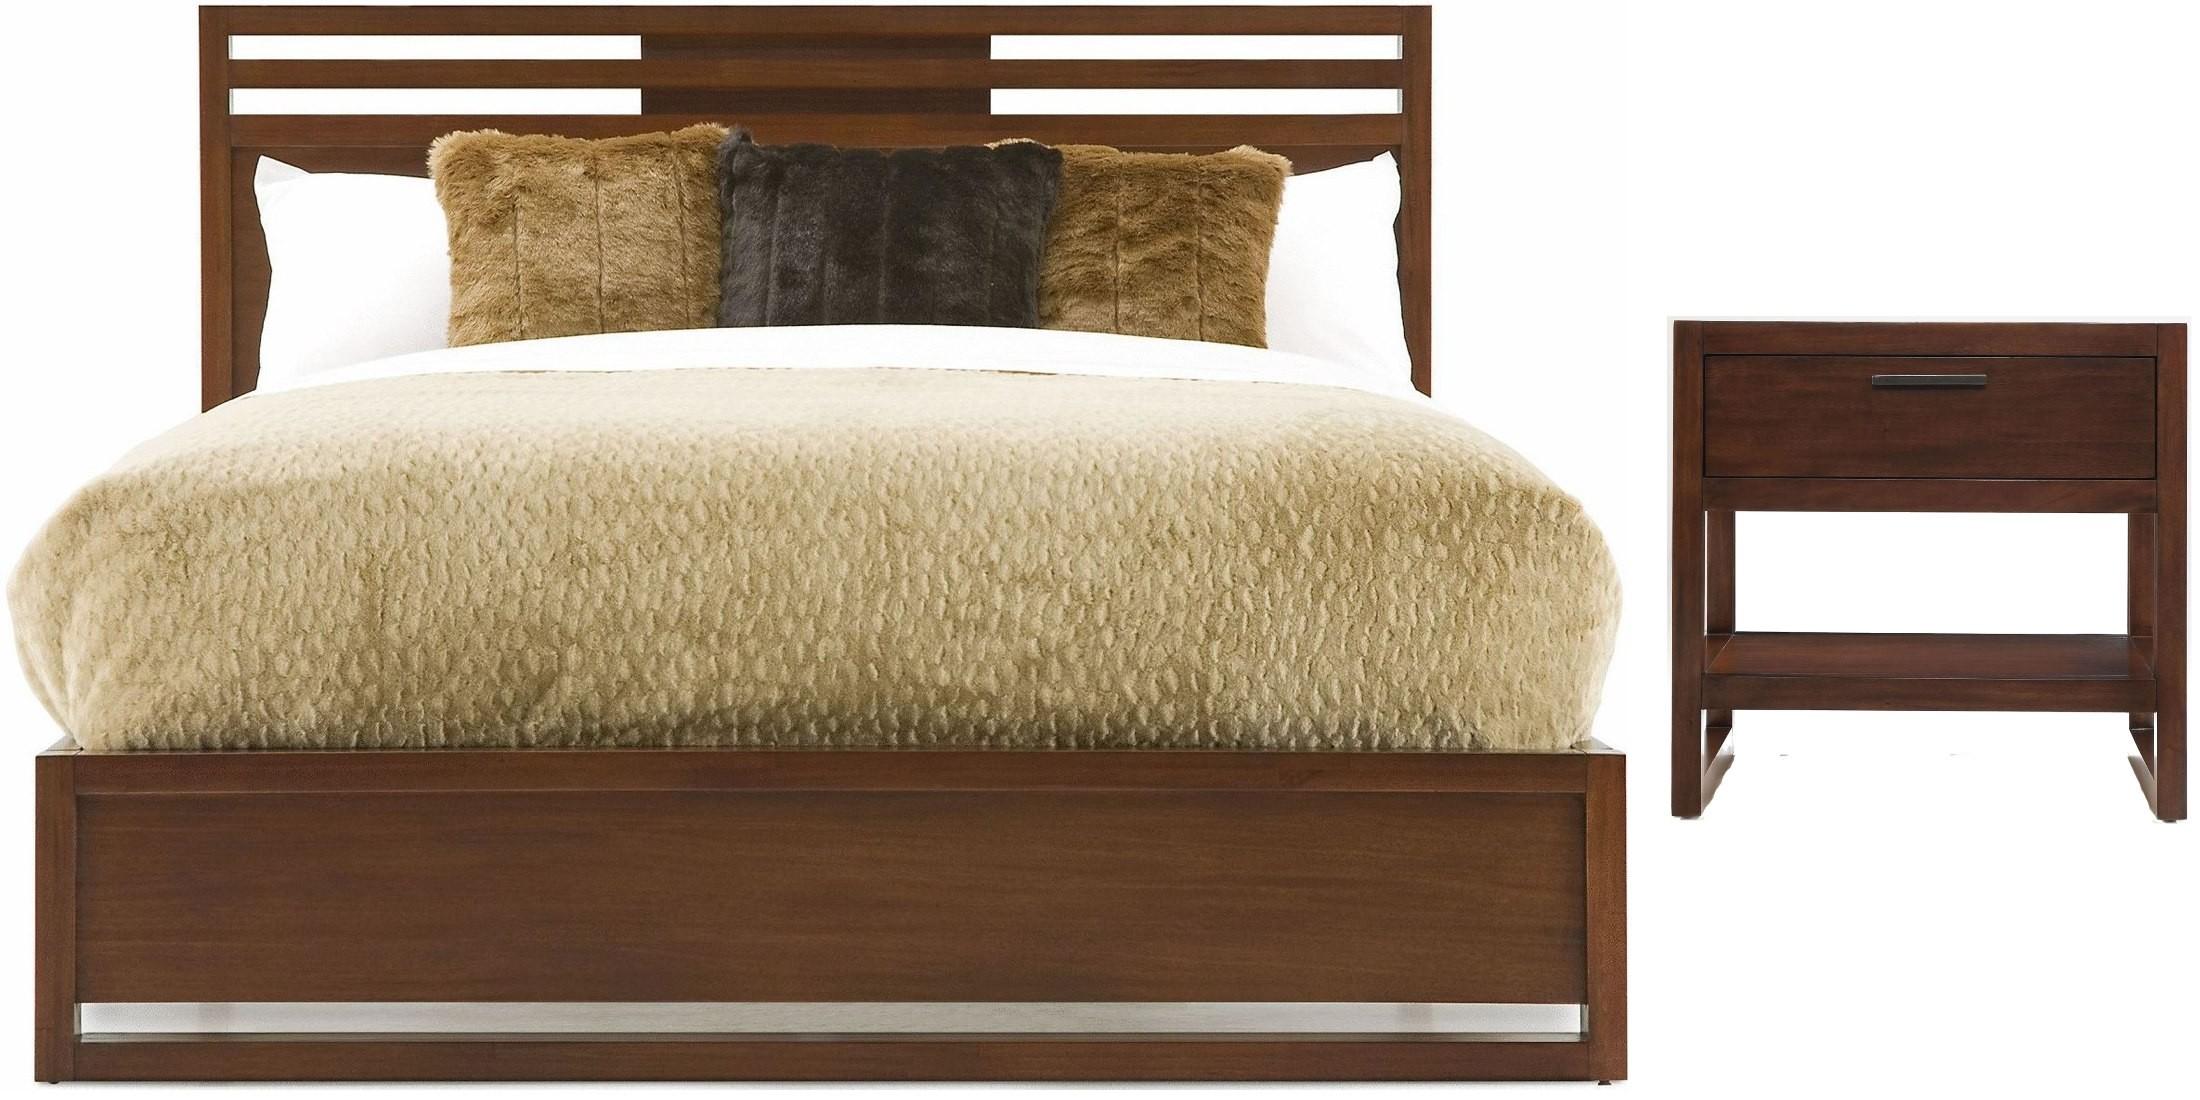 Tahoe Brown Platform Bedroom Set 740 920KQ Casana